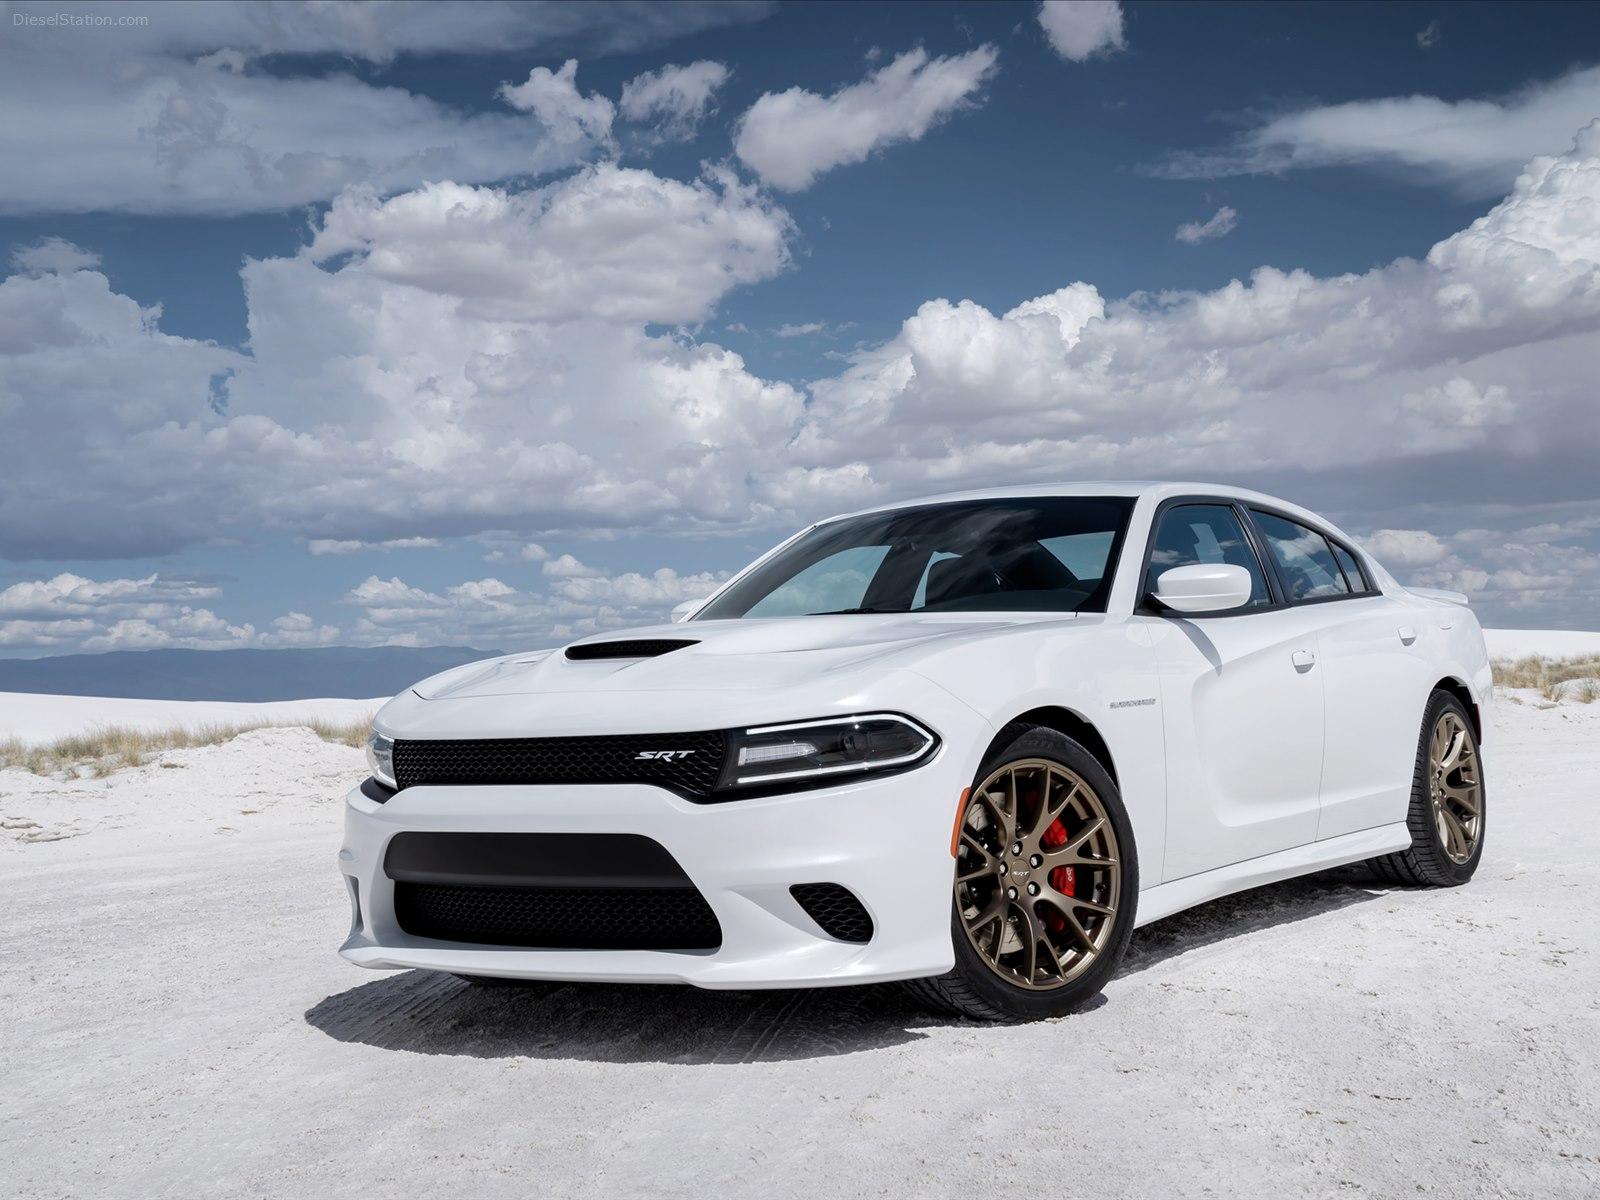 Home Dodge Dodge Charger SRT Hellcat 2015 1600x1200